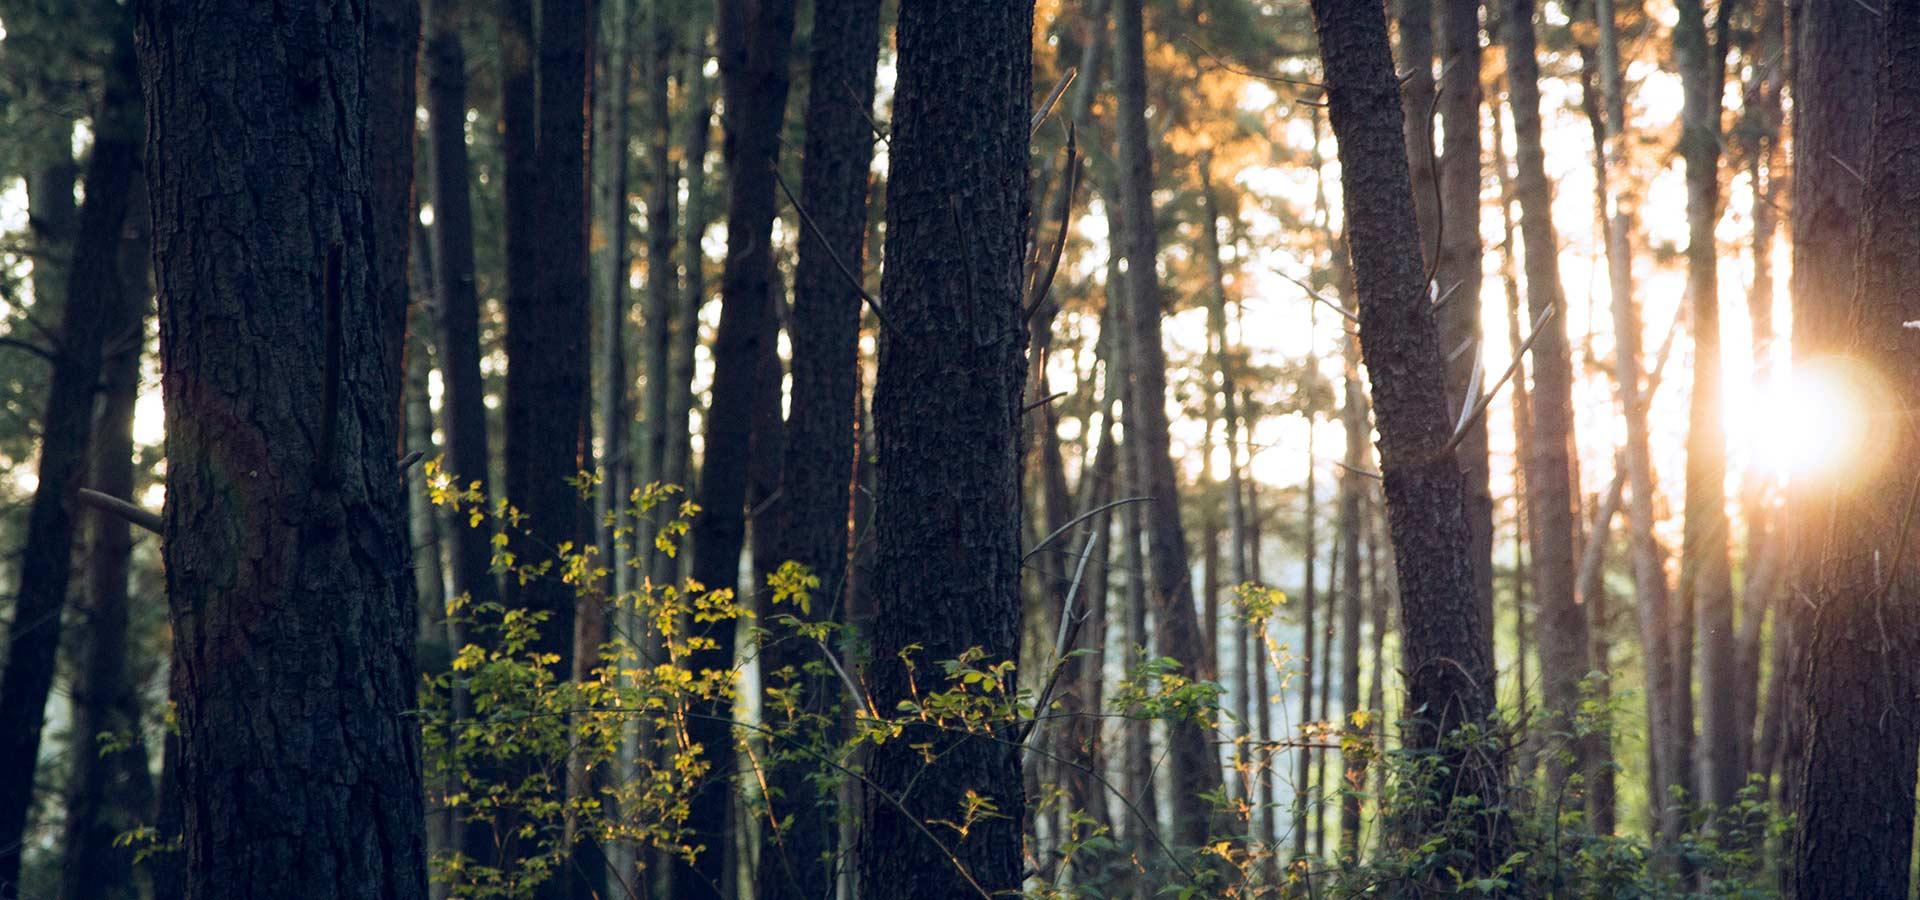 optimization-wood-resources-23